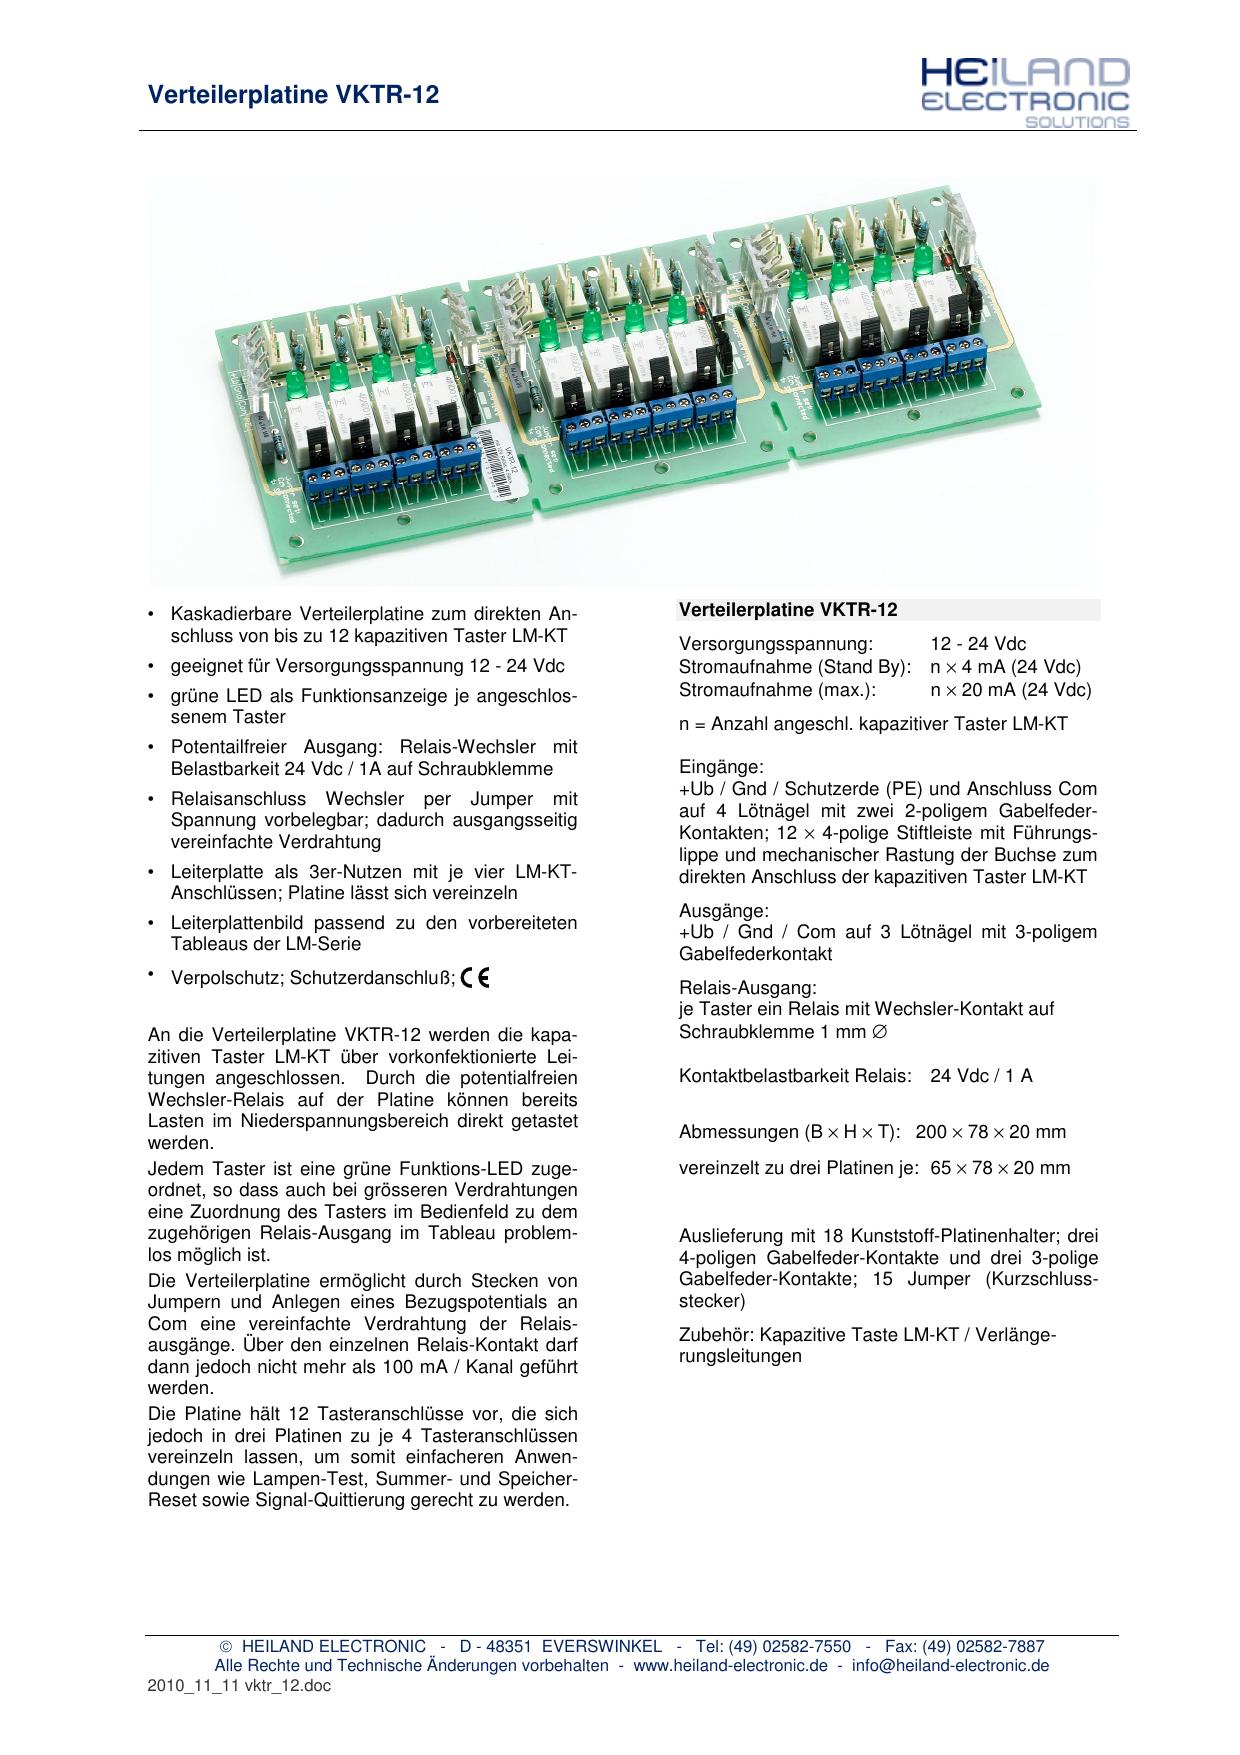 Berühmt 4 Polige Relaisverdrahtung Bilder - Elektrische Schaltplan ...